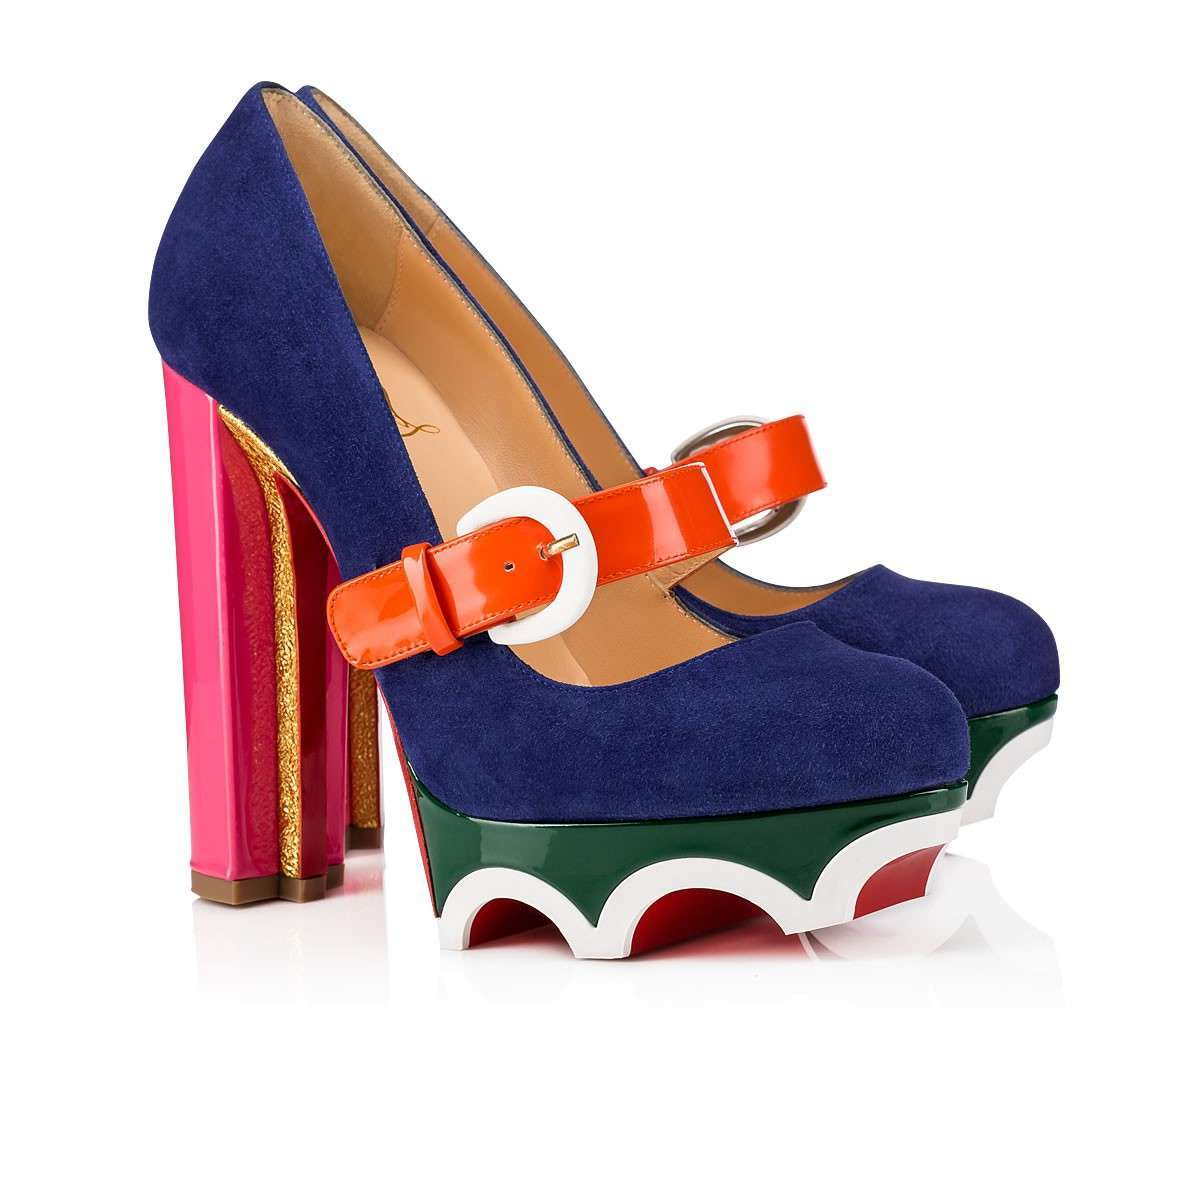 scarpe christian-louboutin (12)